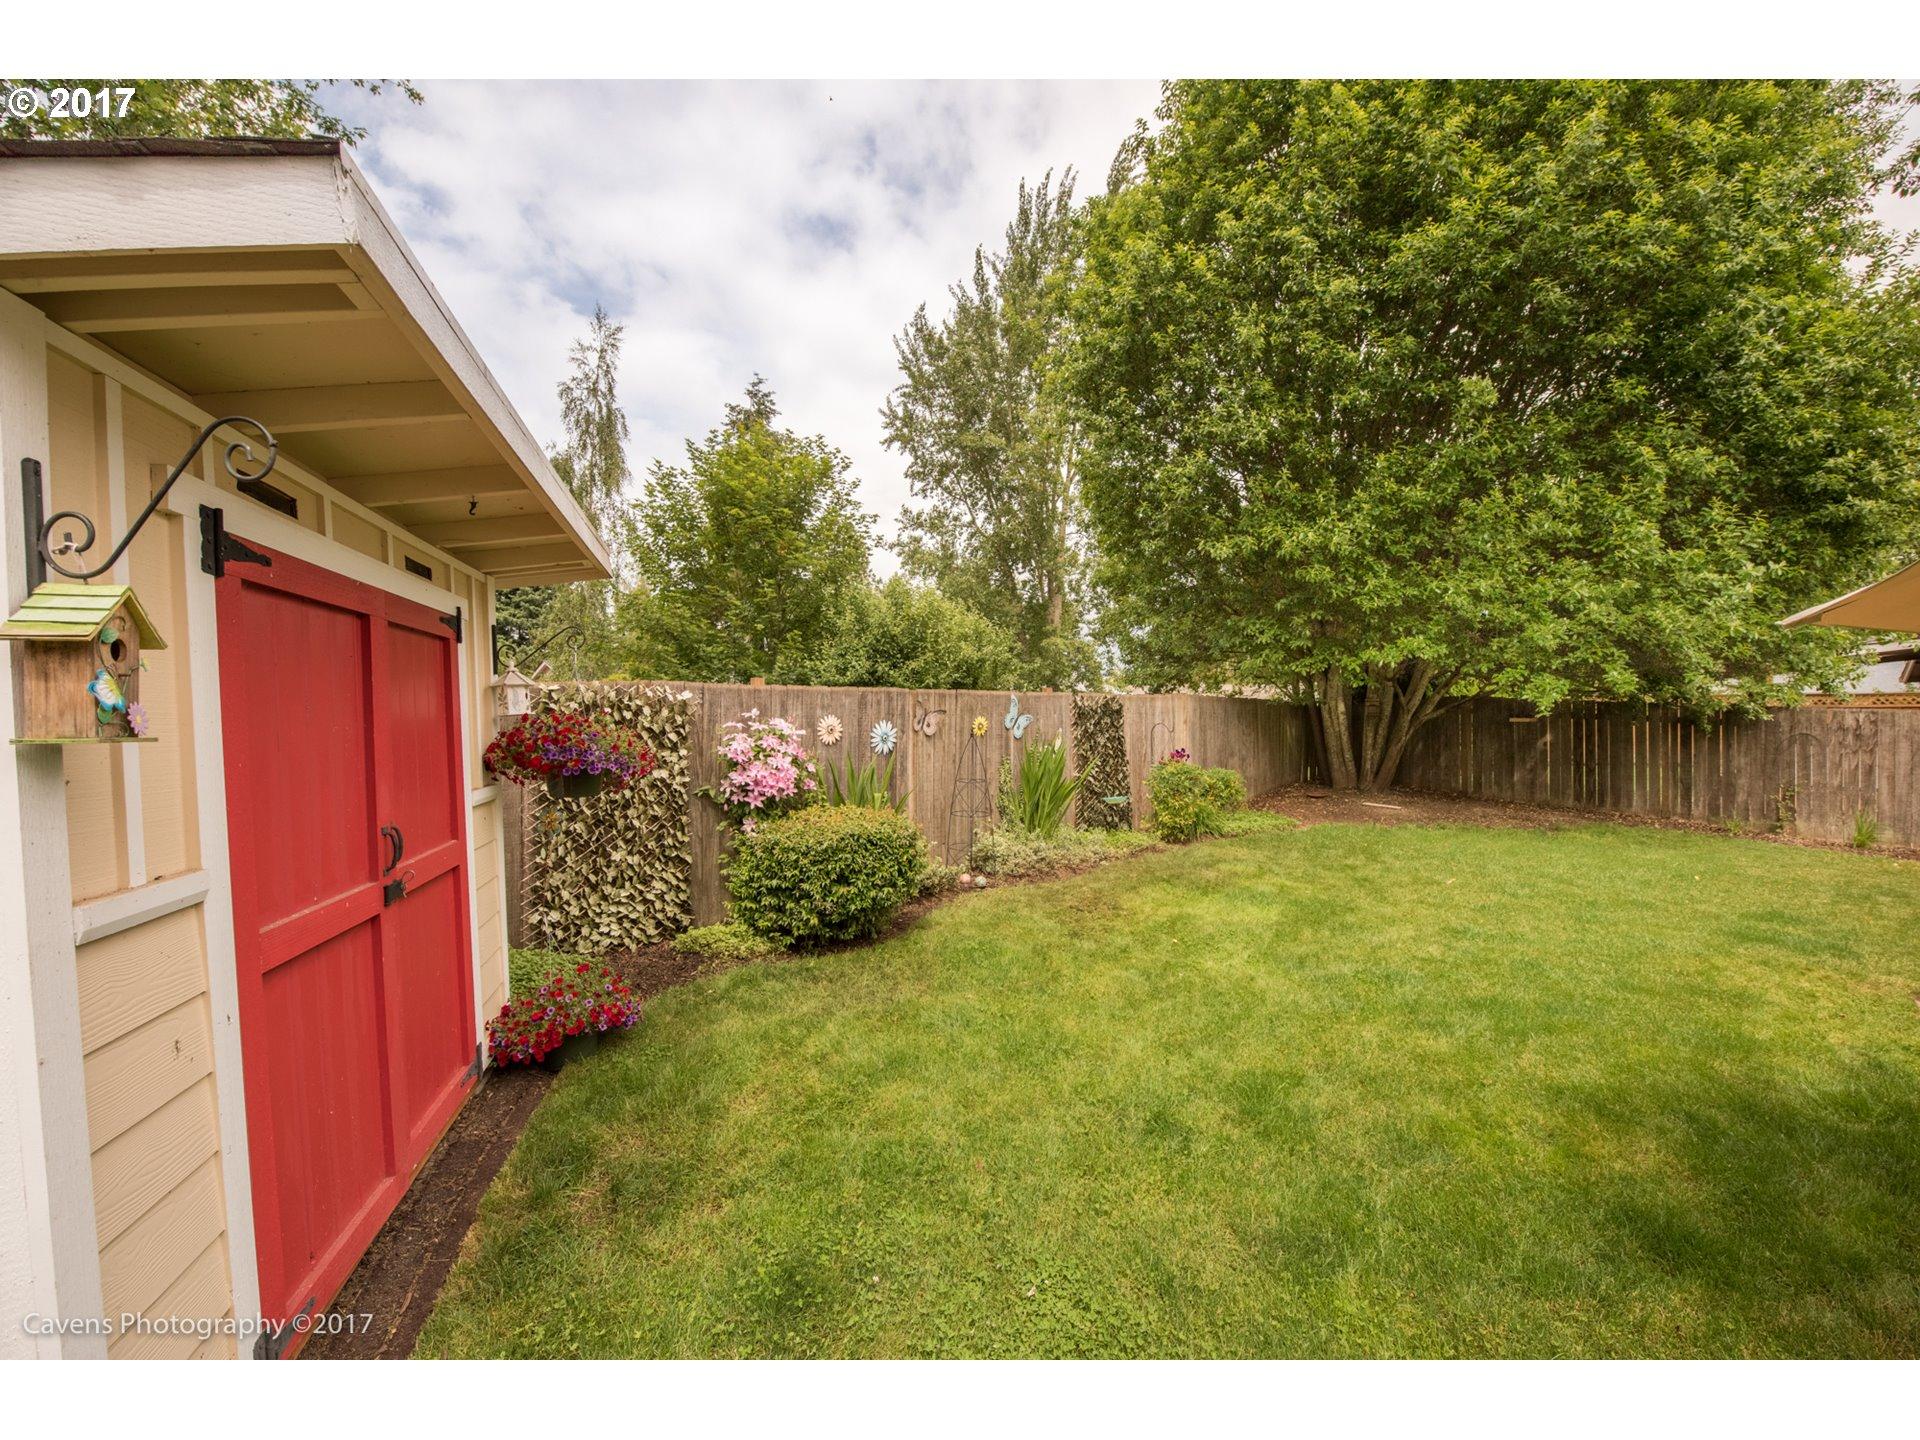 7303 NE 56TH AVE Vancouver, WA 98661 - MLS #: 17617861